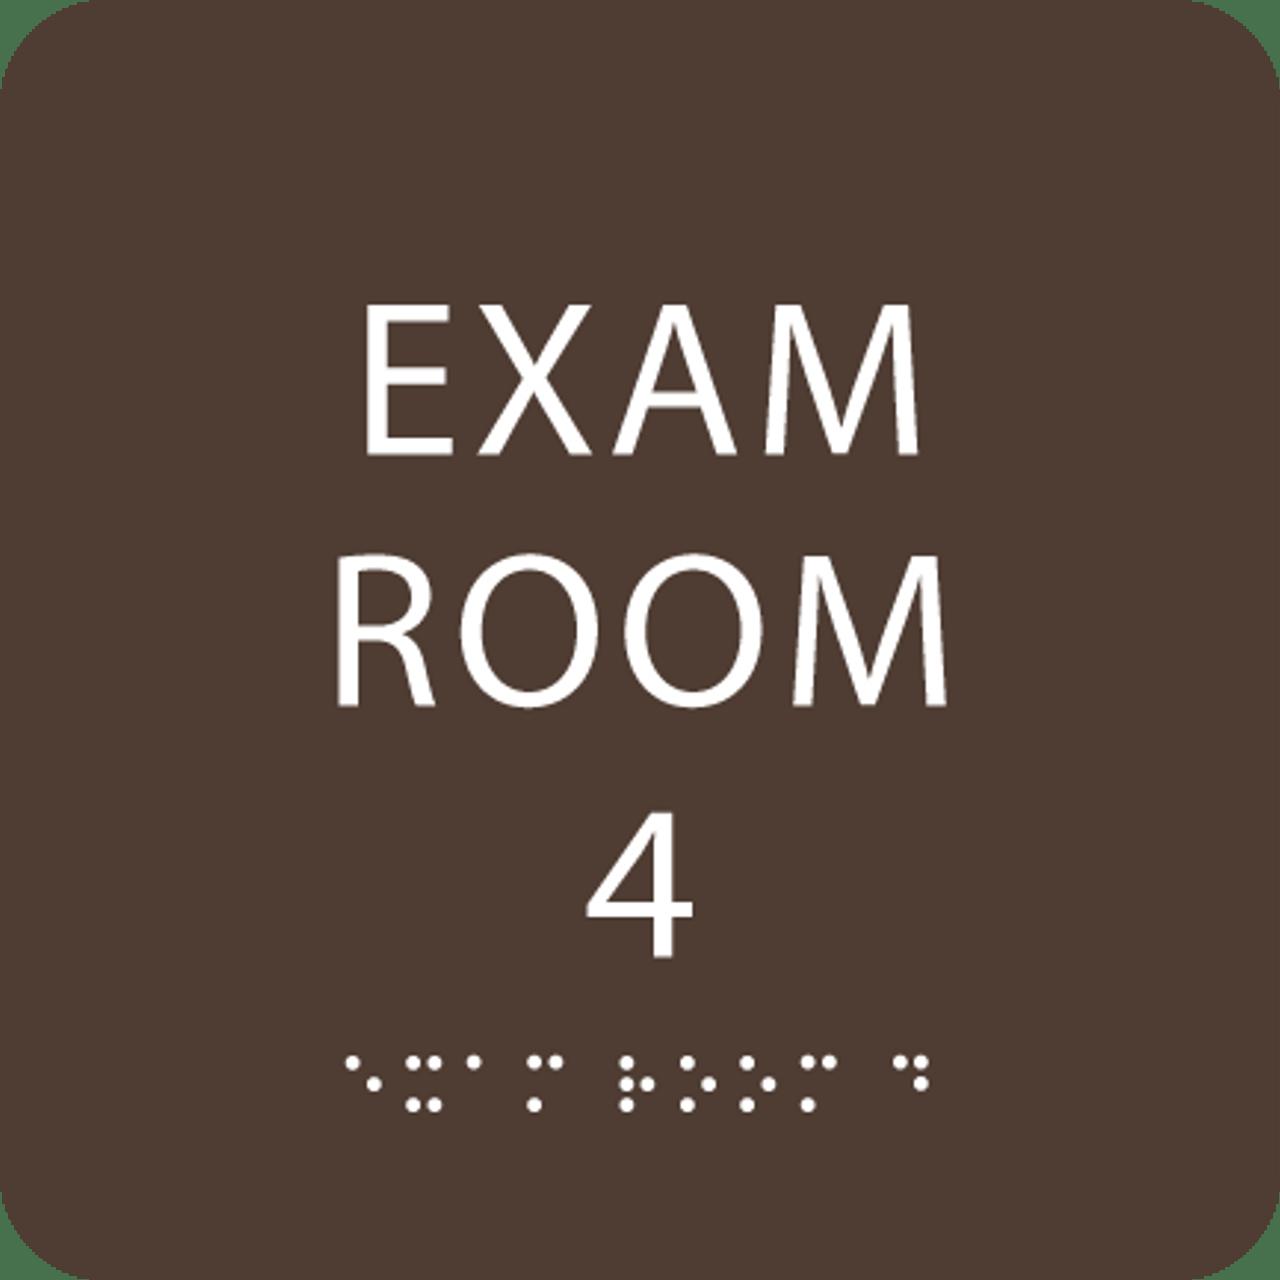 Dark Brown Exam Room 4 ADA Sign